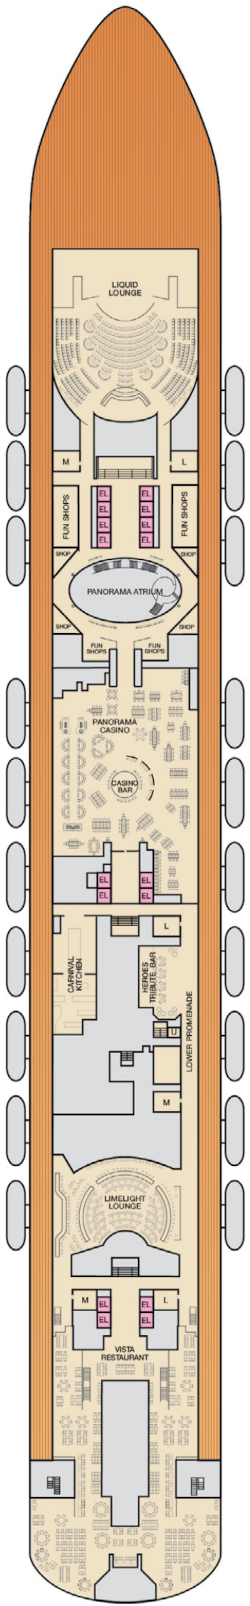 Carnival Panorama Mezzanine Deck Plan